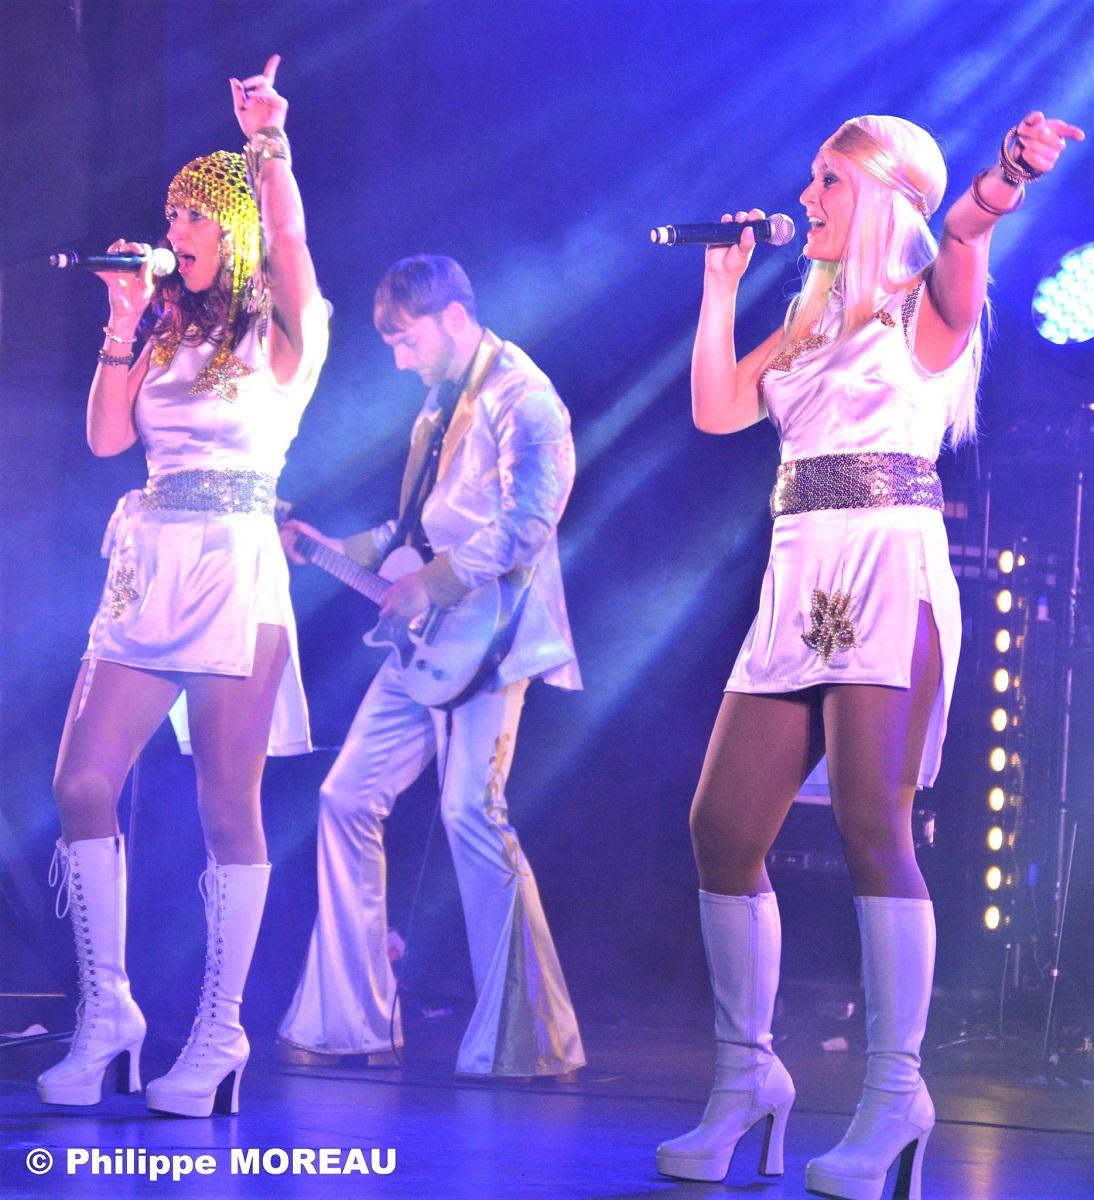 ABBA-Dancing-Queen-ABBA-abba-show-ABBA-Mamma-Mia-ABBA-Tribute-Band-Thank-you-for-the-music